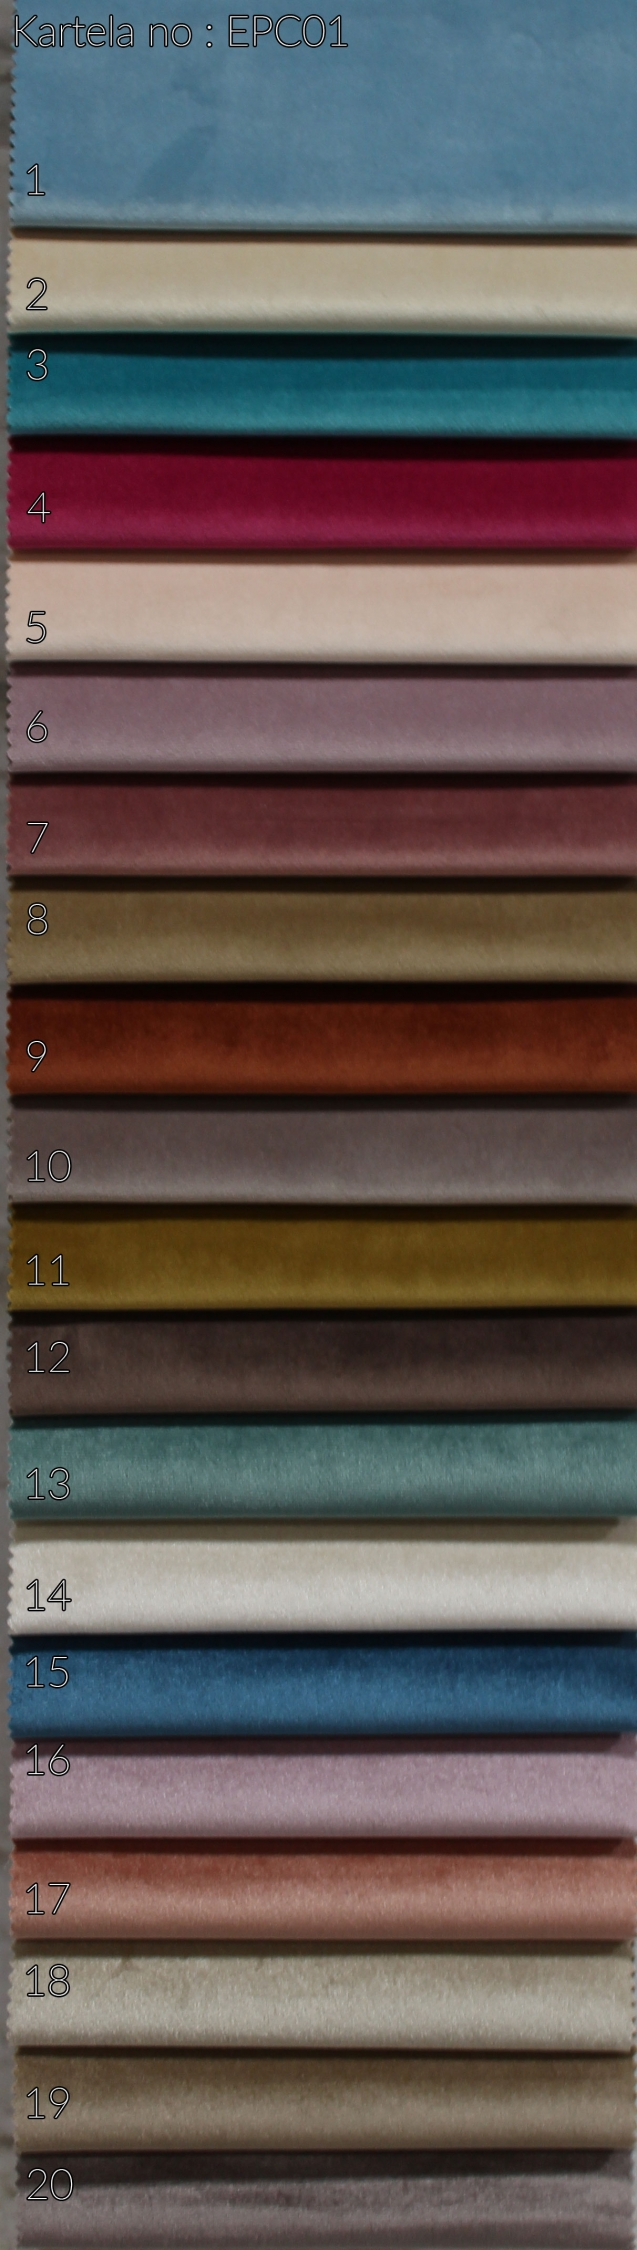 Elegant Kose Takimi Yatakli Taki Koltuklar Ve Renkler